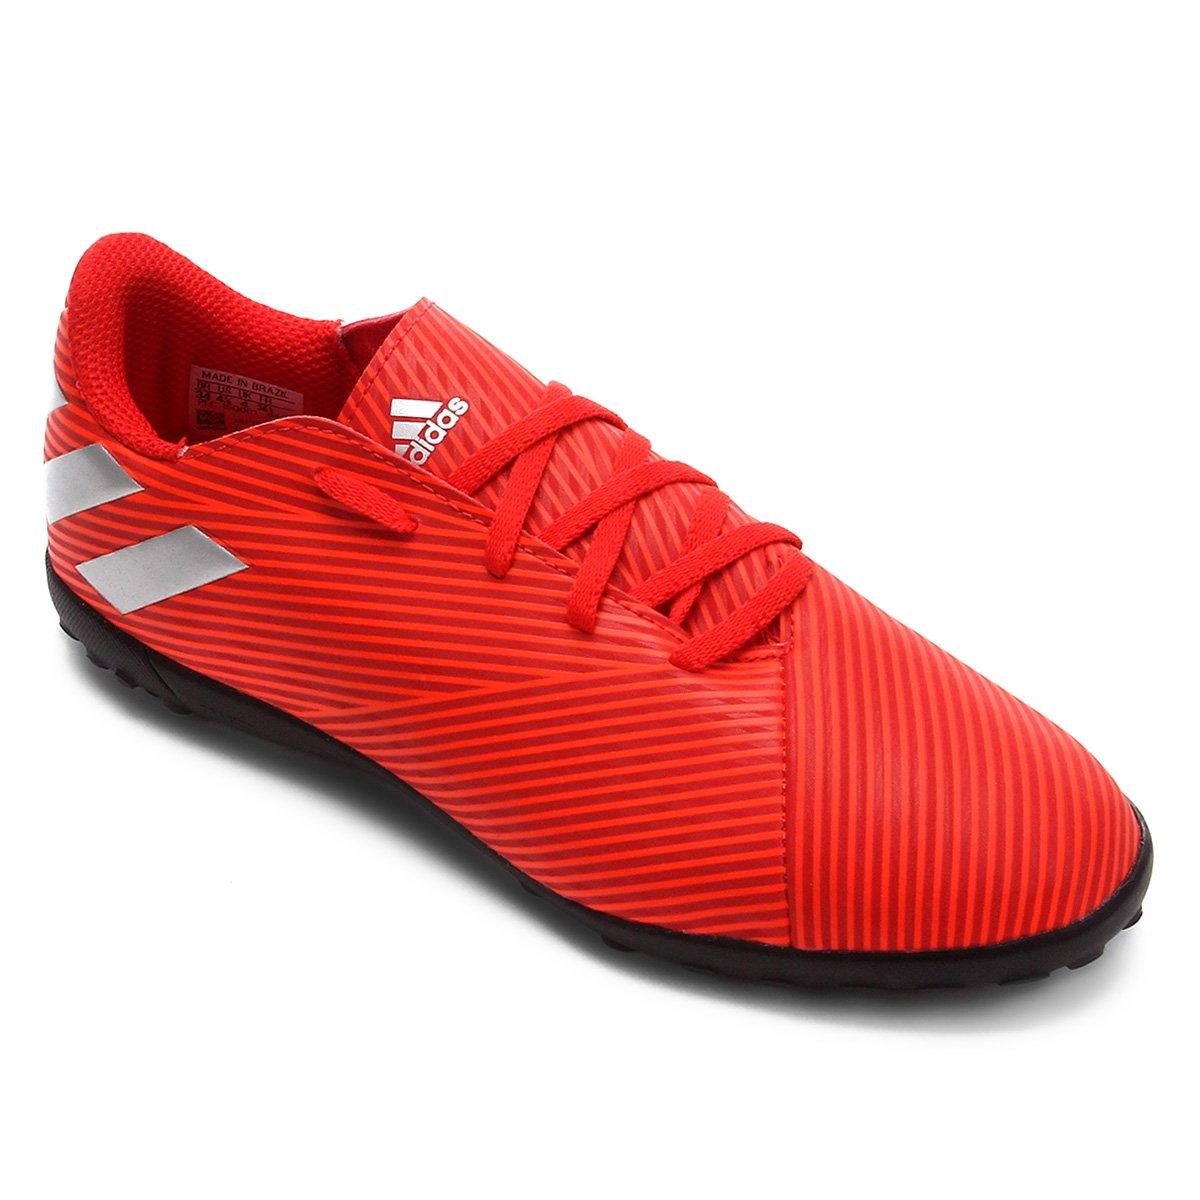 Chuteira Society Juvenil Adidas Nemeziz 19 4 TF - Vermelho